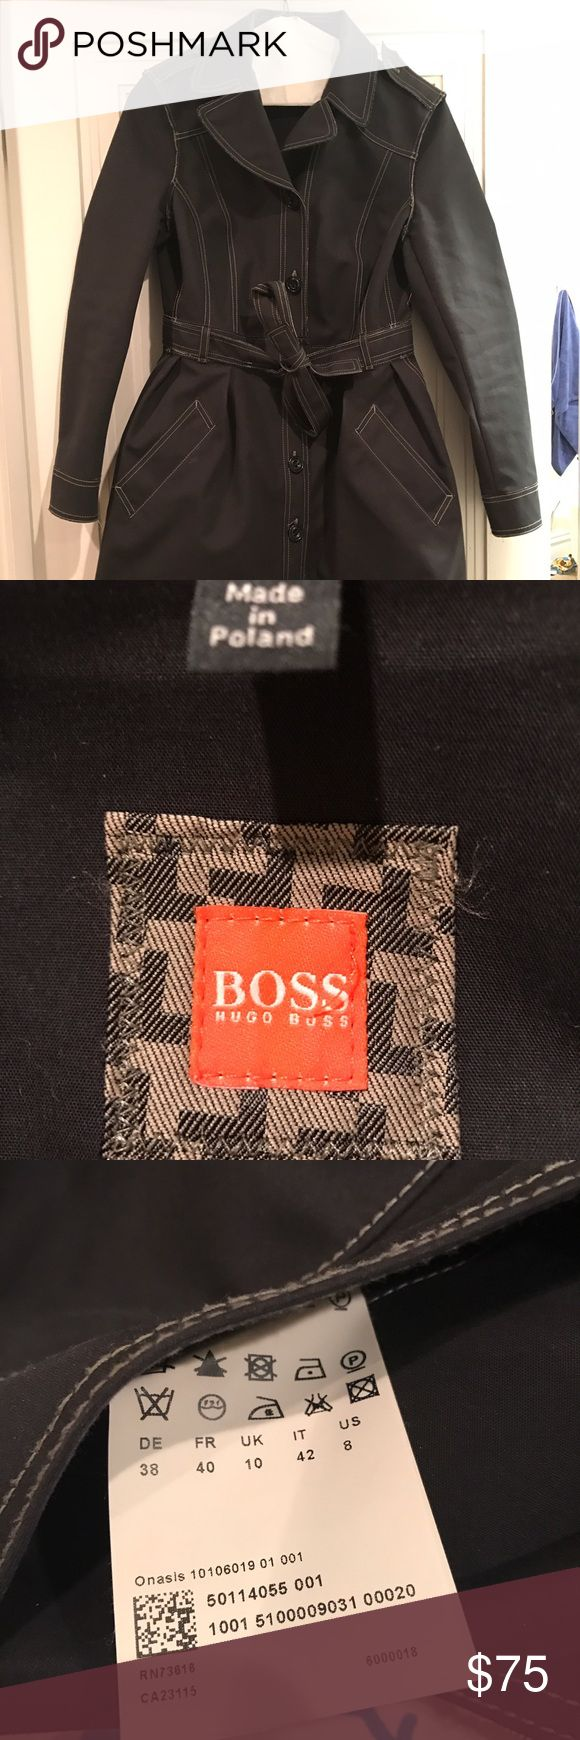 Selling this Hugo Boss trench coat on Poshmark! My username is: aliciashroff. #shopmycloset #poshmark #fashion #shopping #style #forsale #BOSS ORANGE #Jackets & Blazers